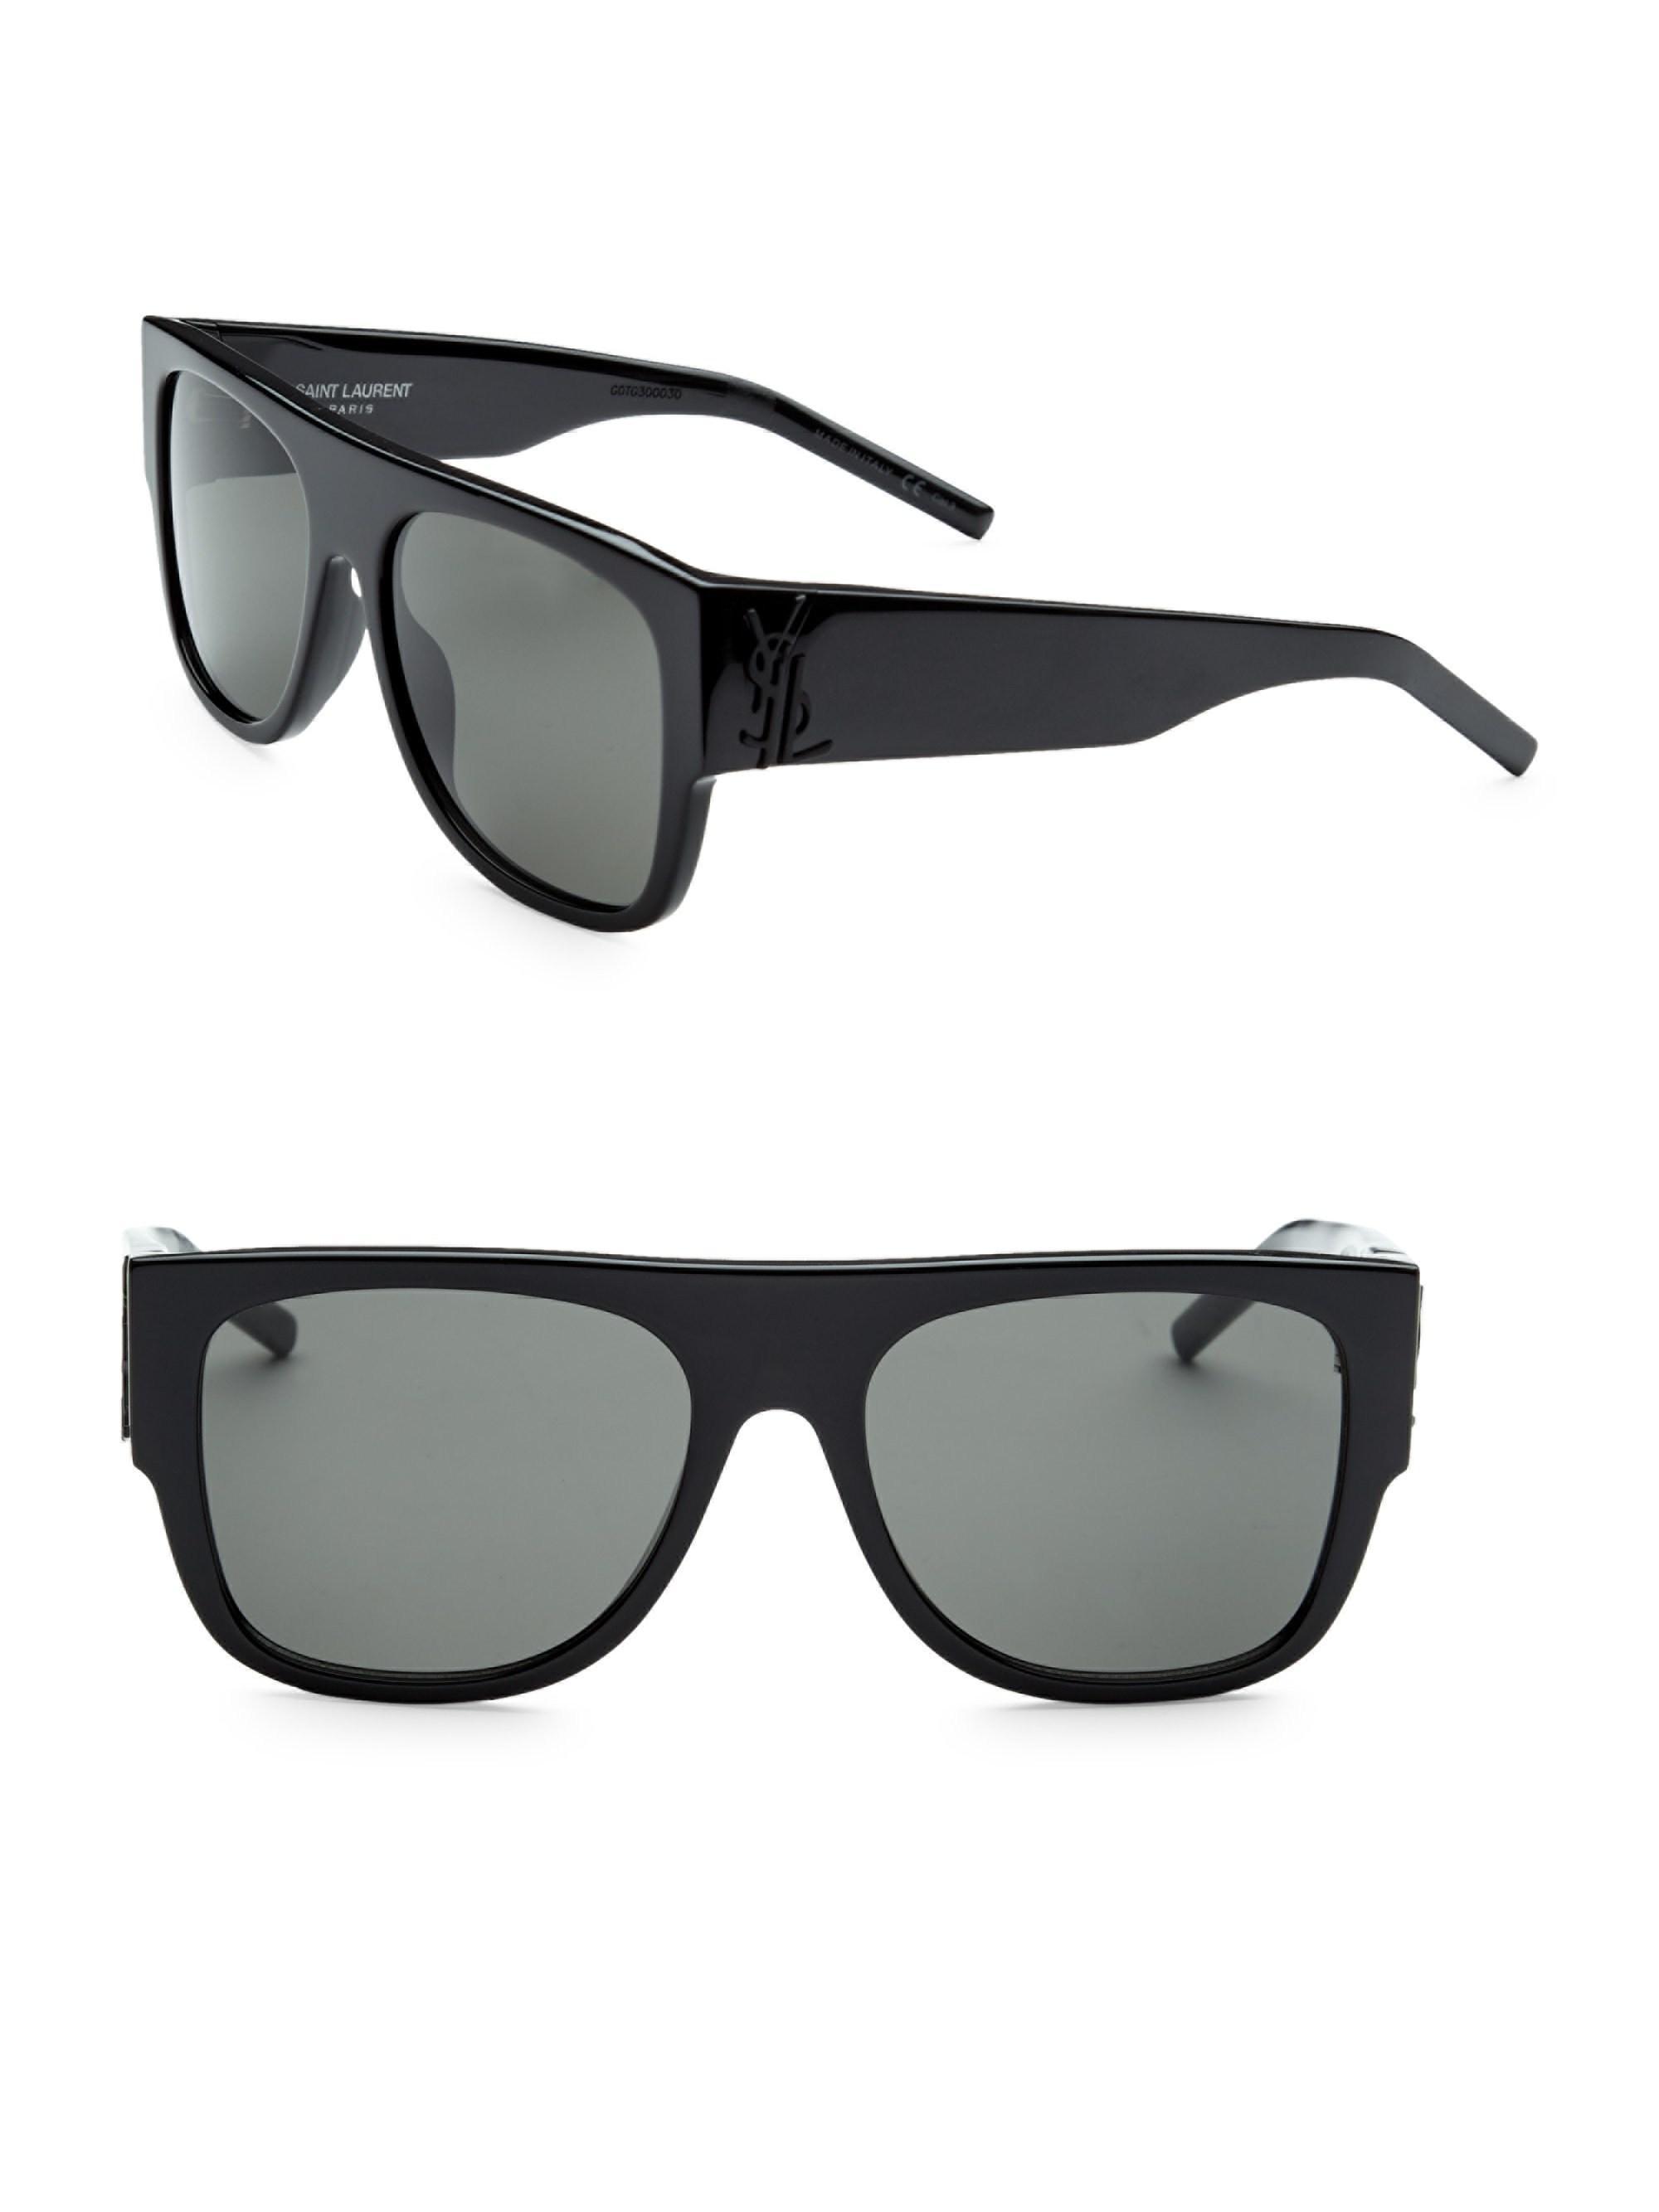 d1601aef73 Lyst - Saint Laurent Men s 55mm Squared Flat Top Sunglasses - Black ...